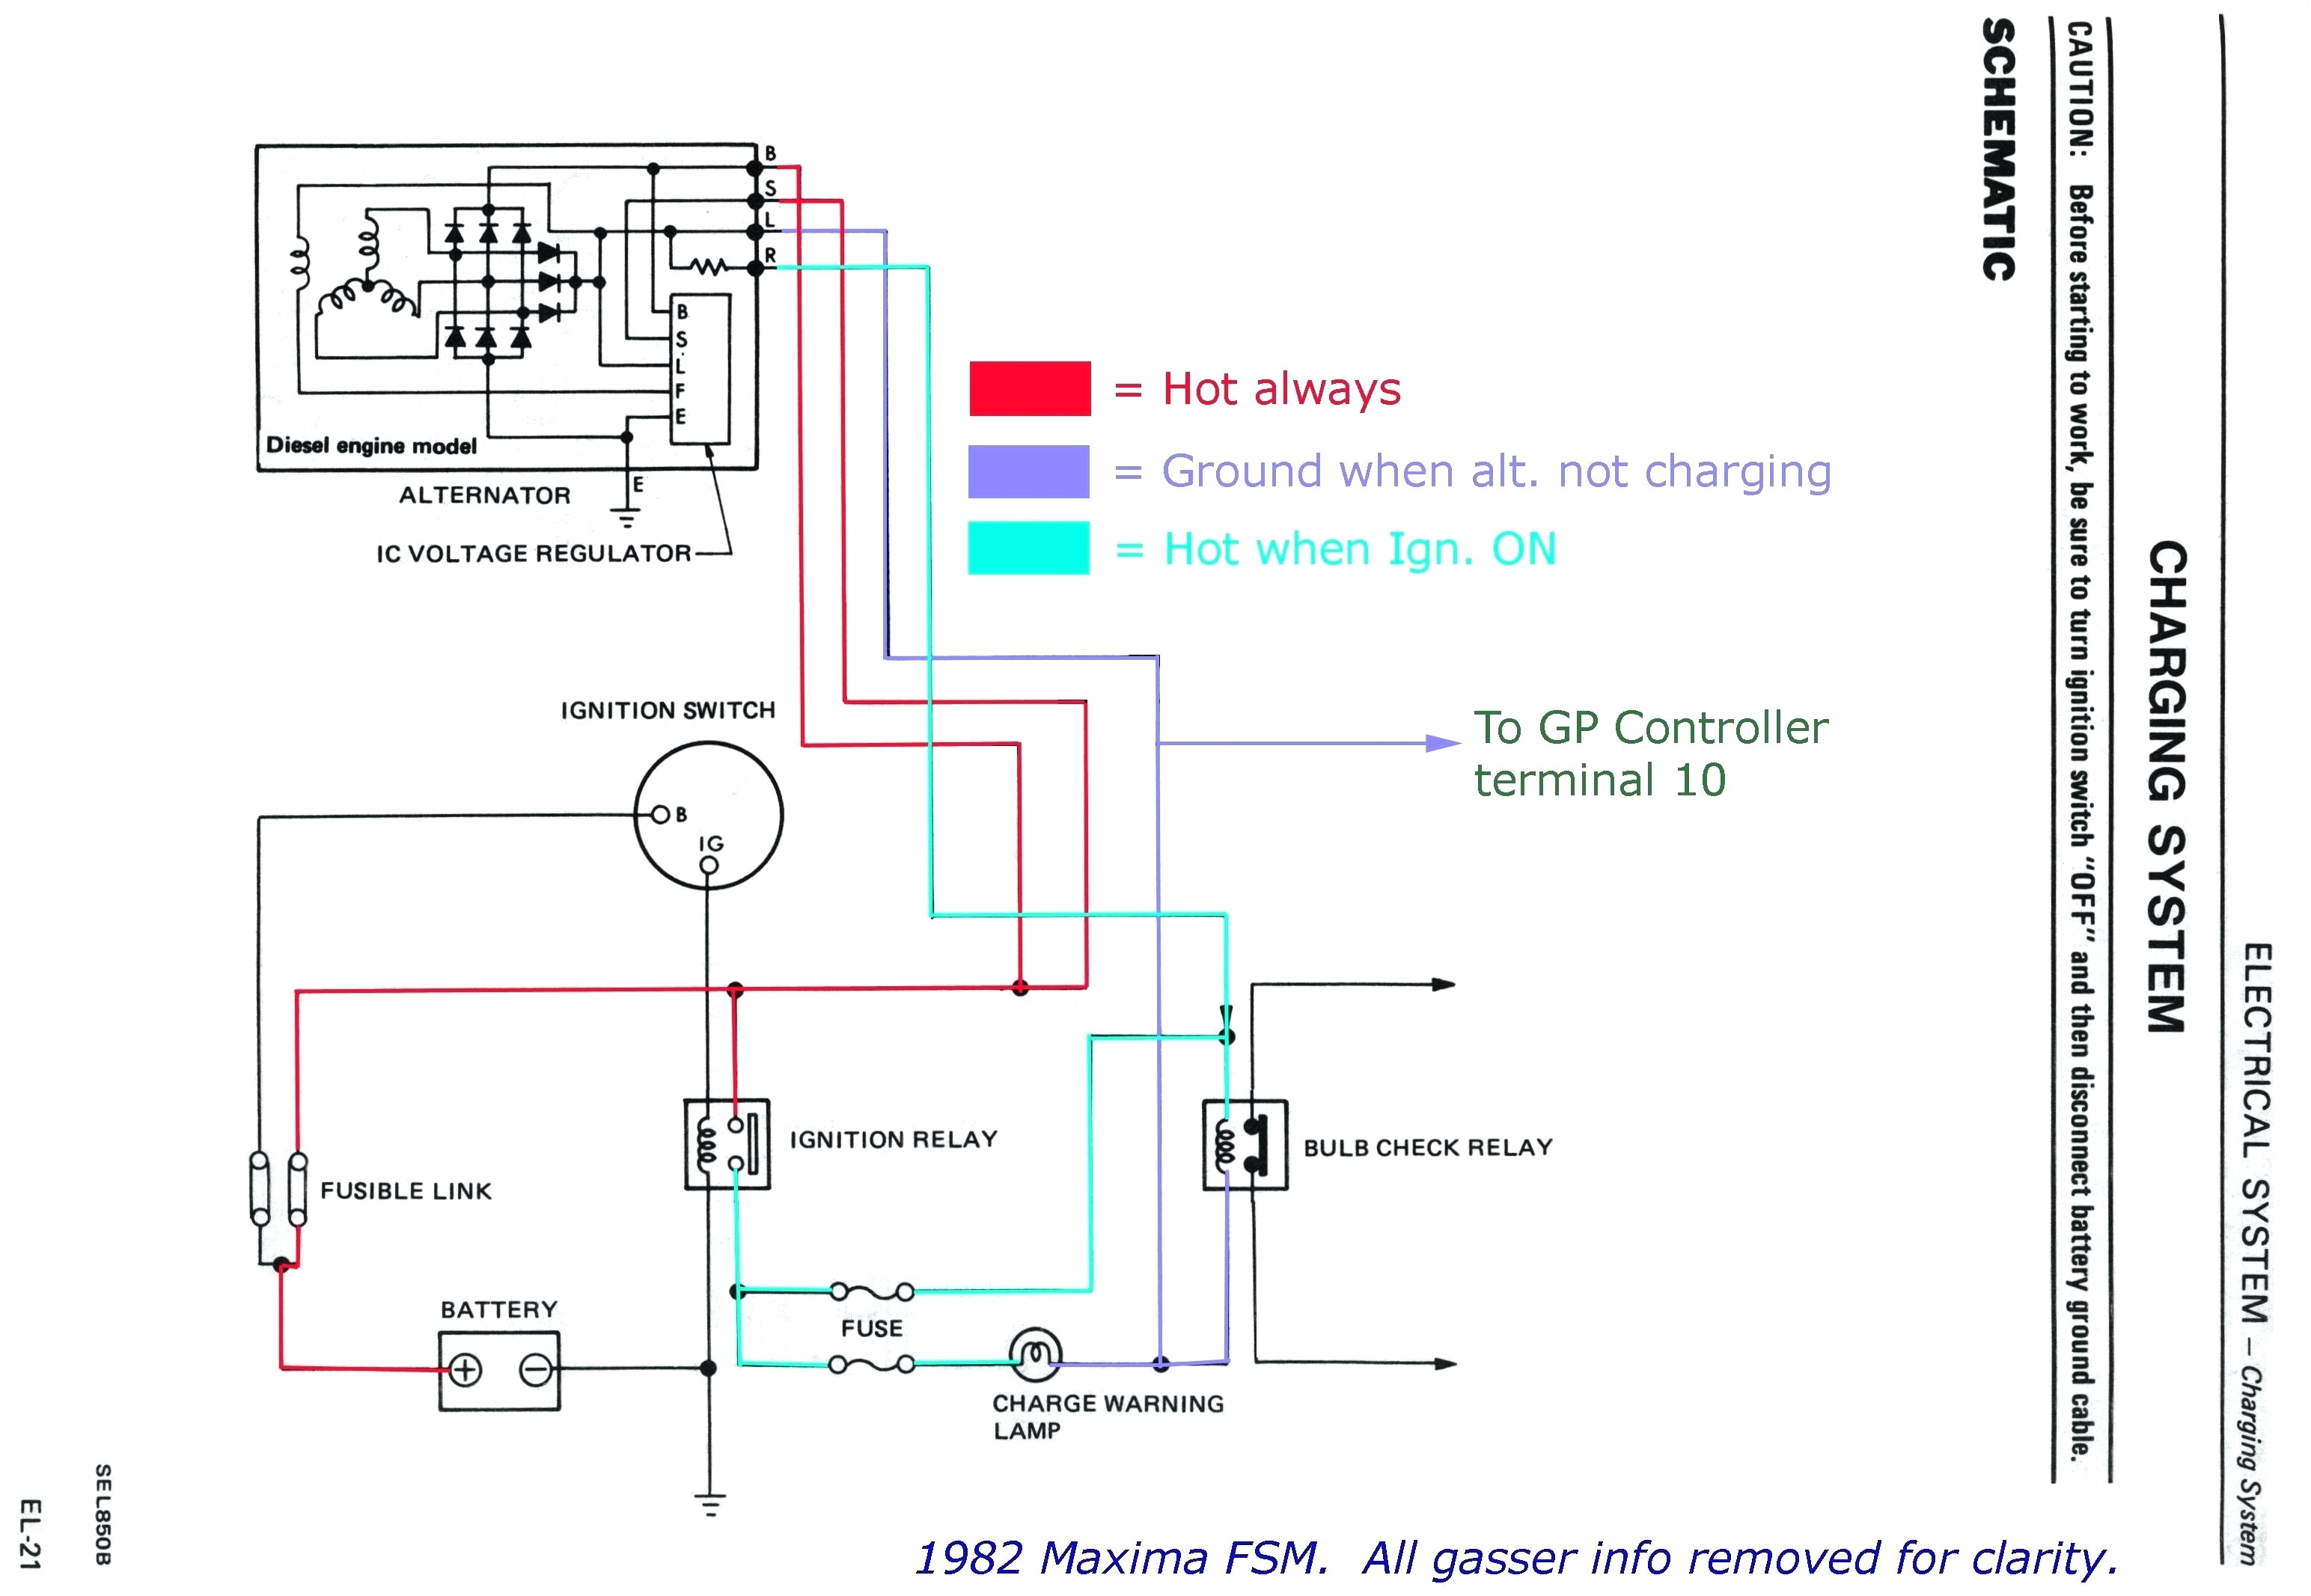 diesel engine alternator wiring diagram new toyota alternator wiring diagram beautiful 1983 toyota pickup wiring of diesel engine alternator wiring diagram jpg